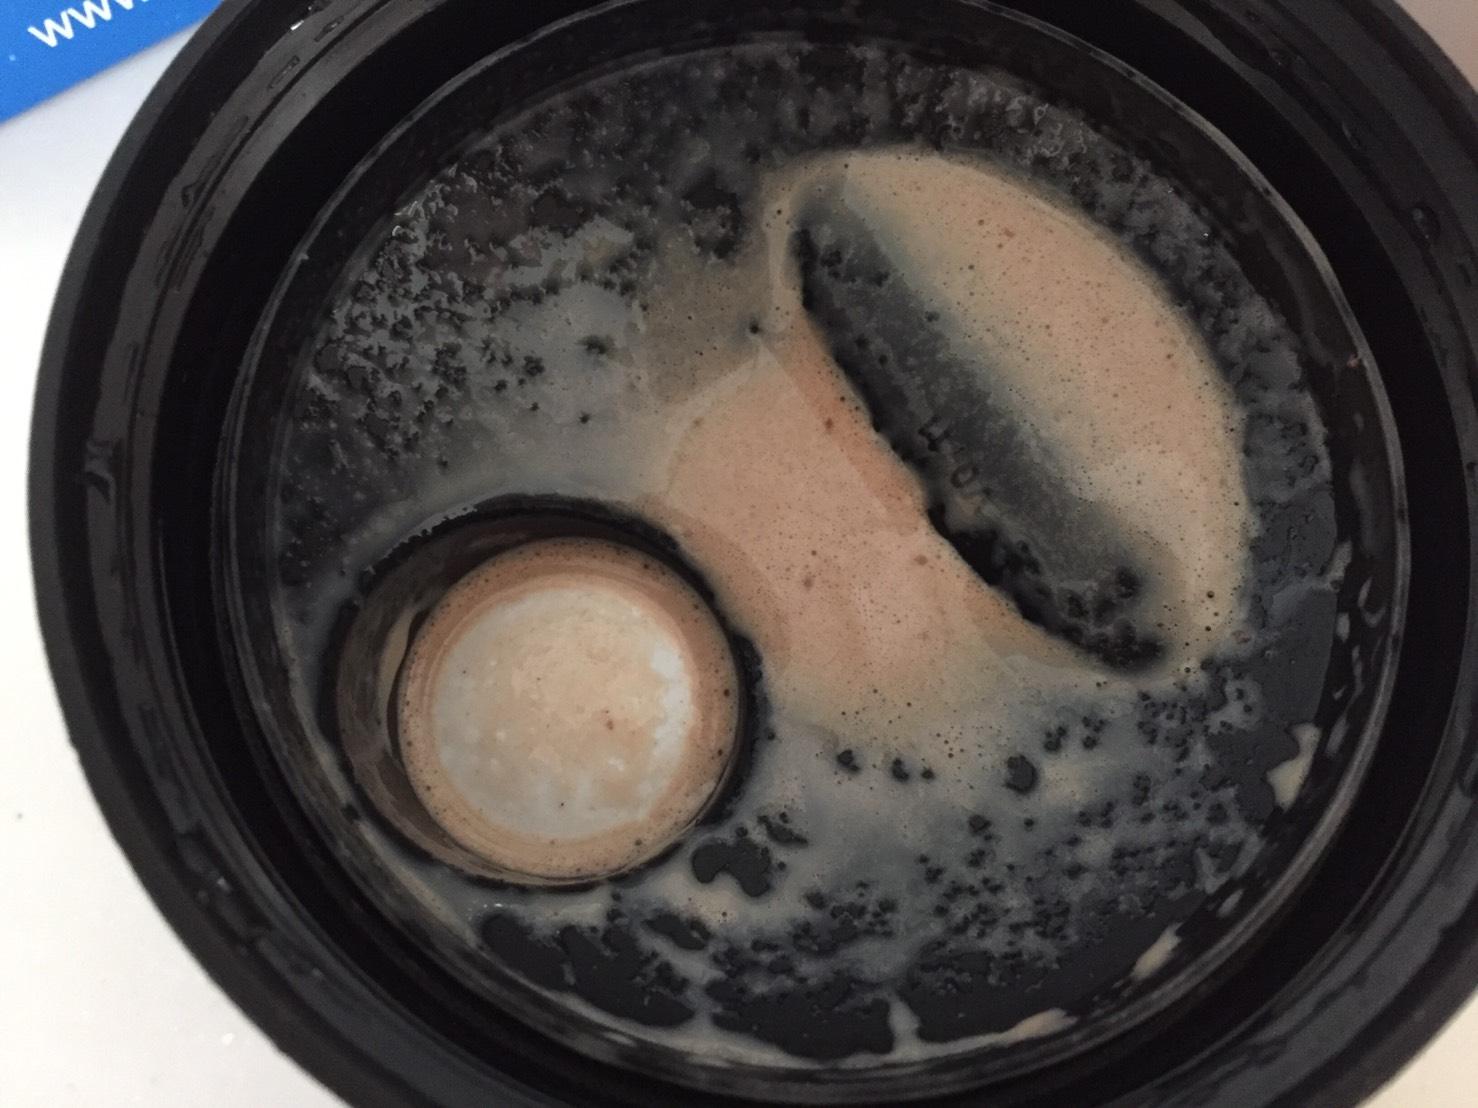 【WPC】Impactホエイプロテイン「Chocolate Brownie(チョコレートブラウニー味)」を牛乳で溶かした時の様子。蓋側